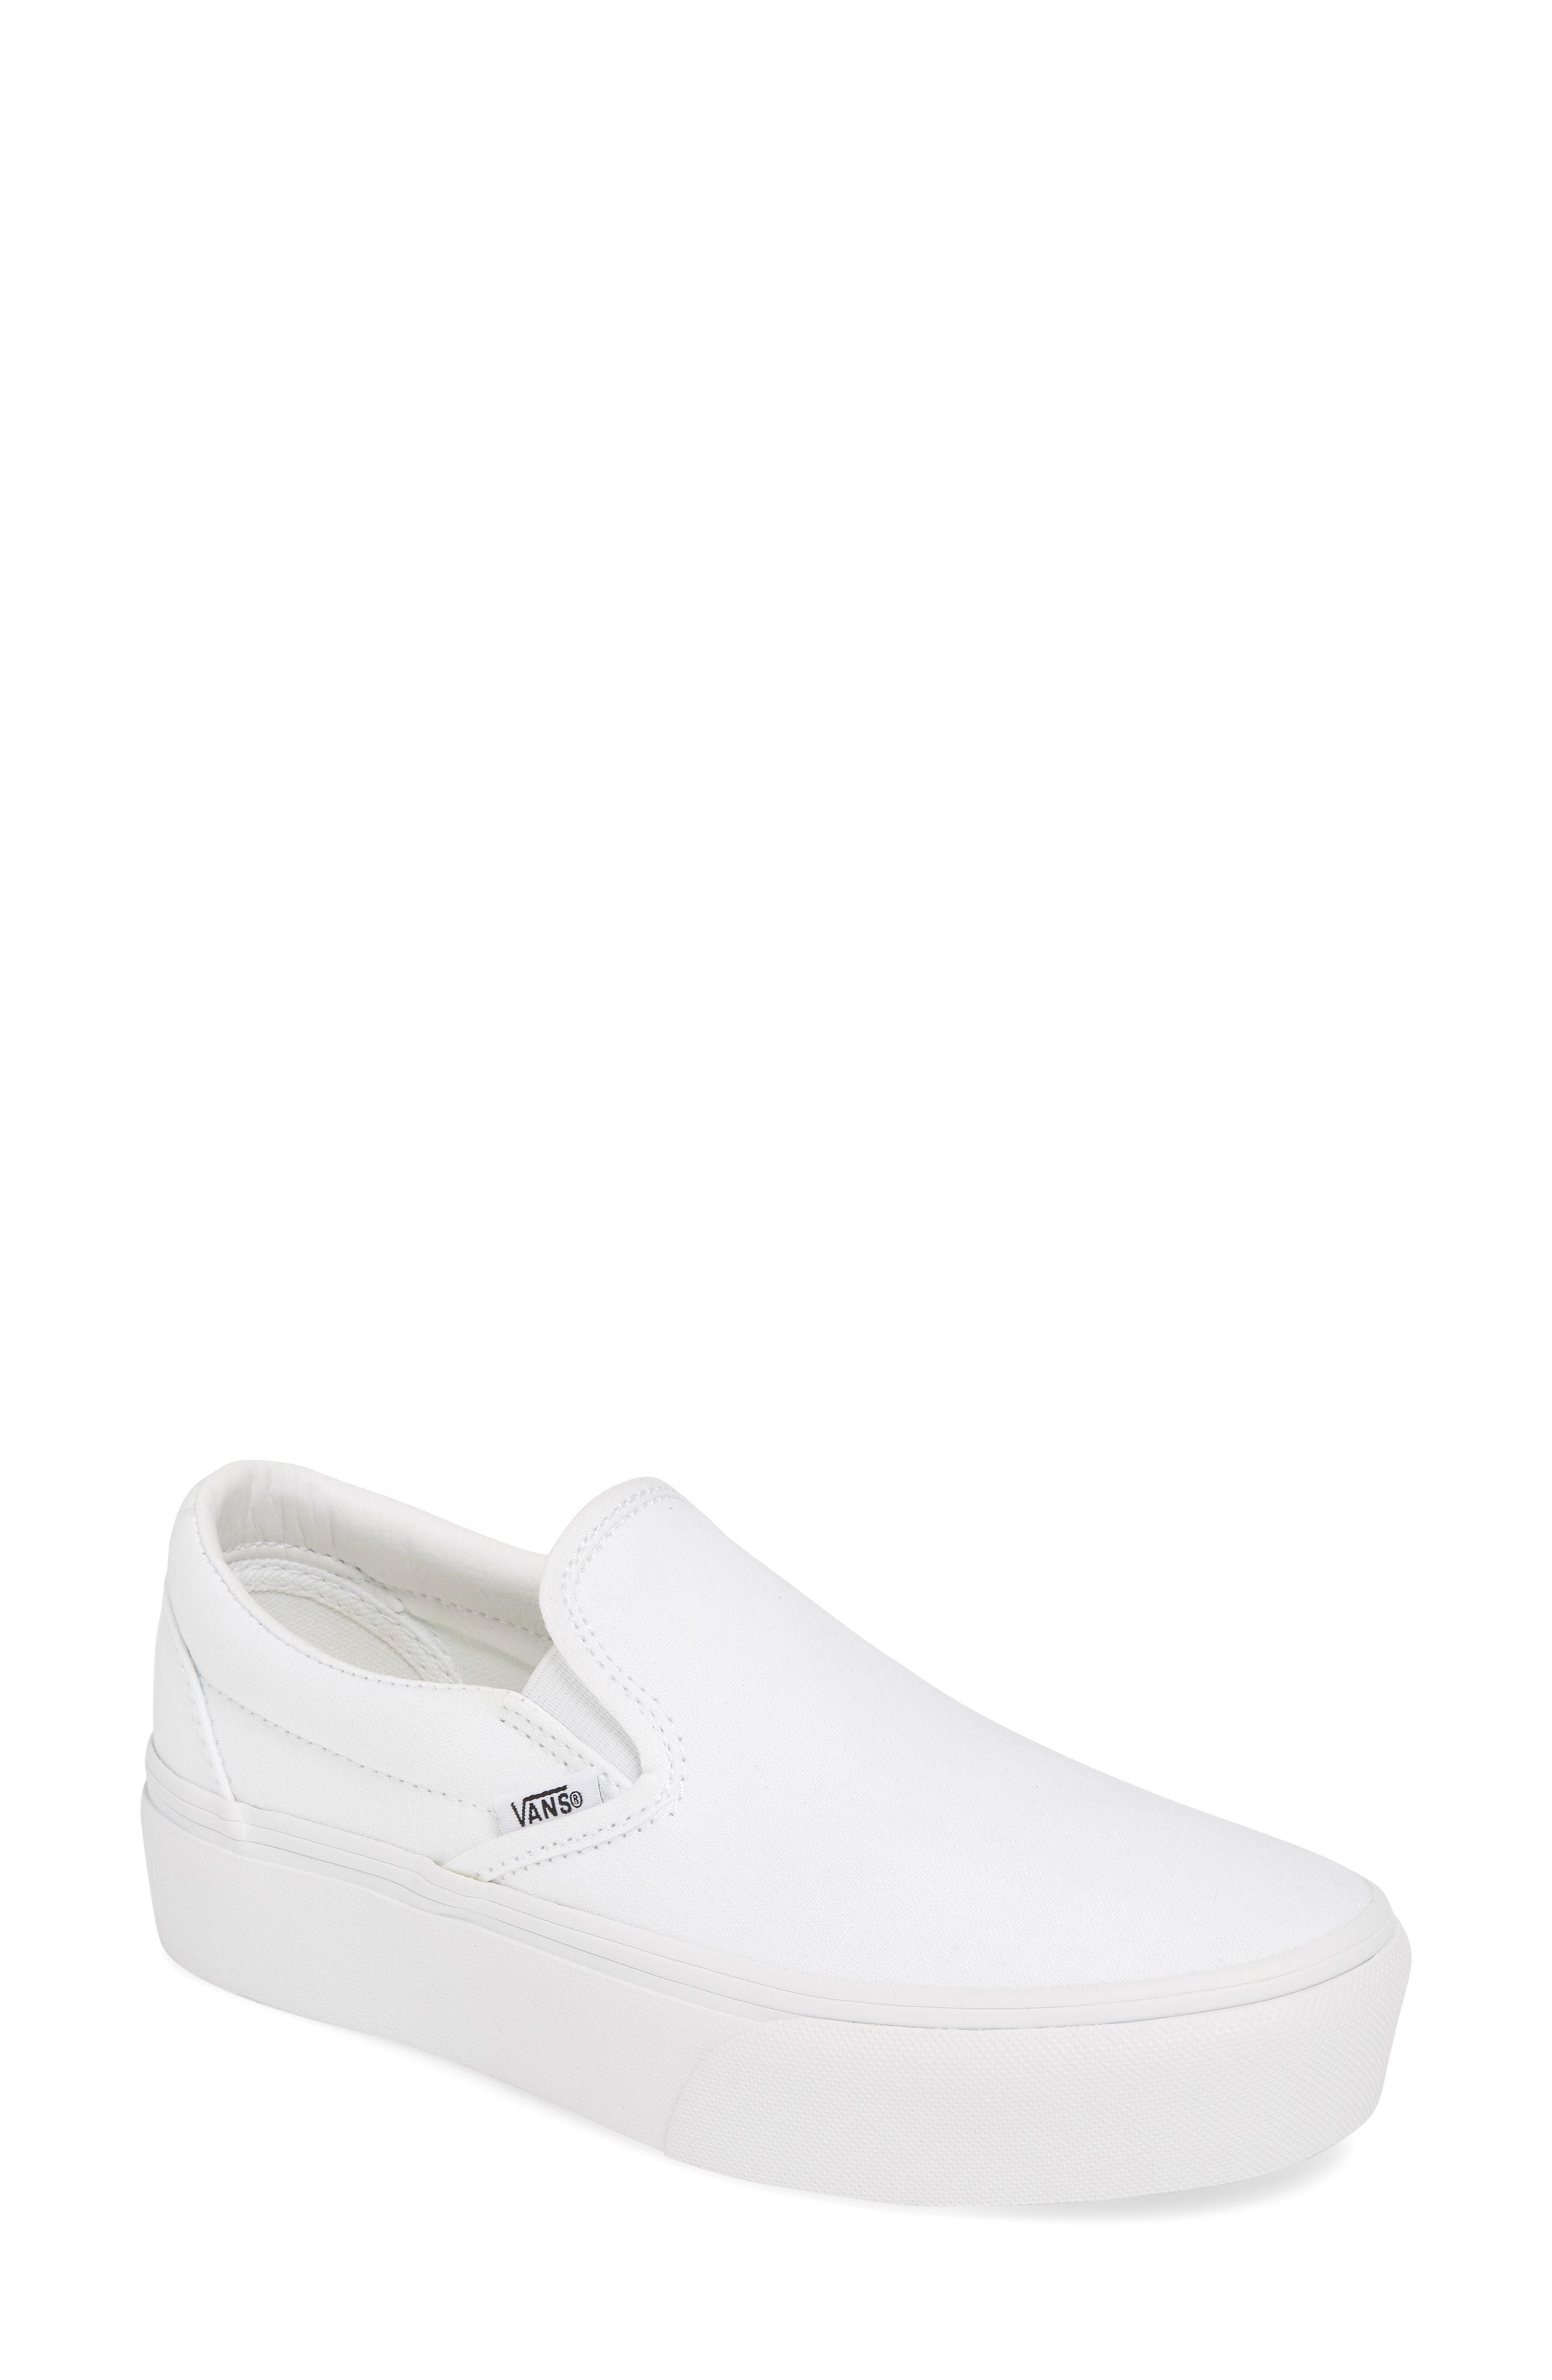 Vans Platform Slip On Sneaker, $54